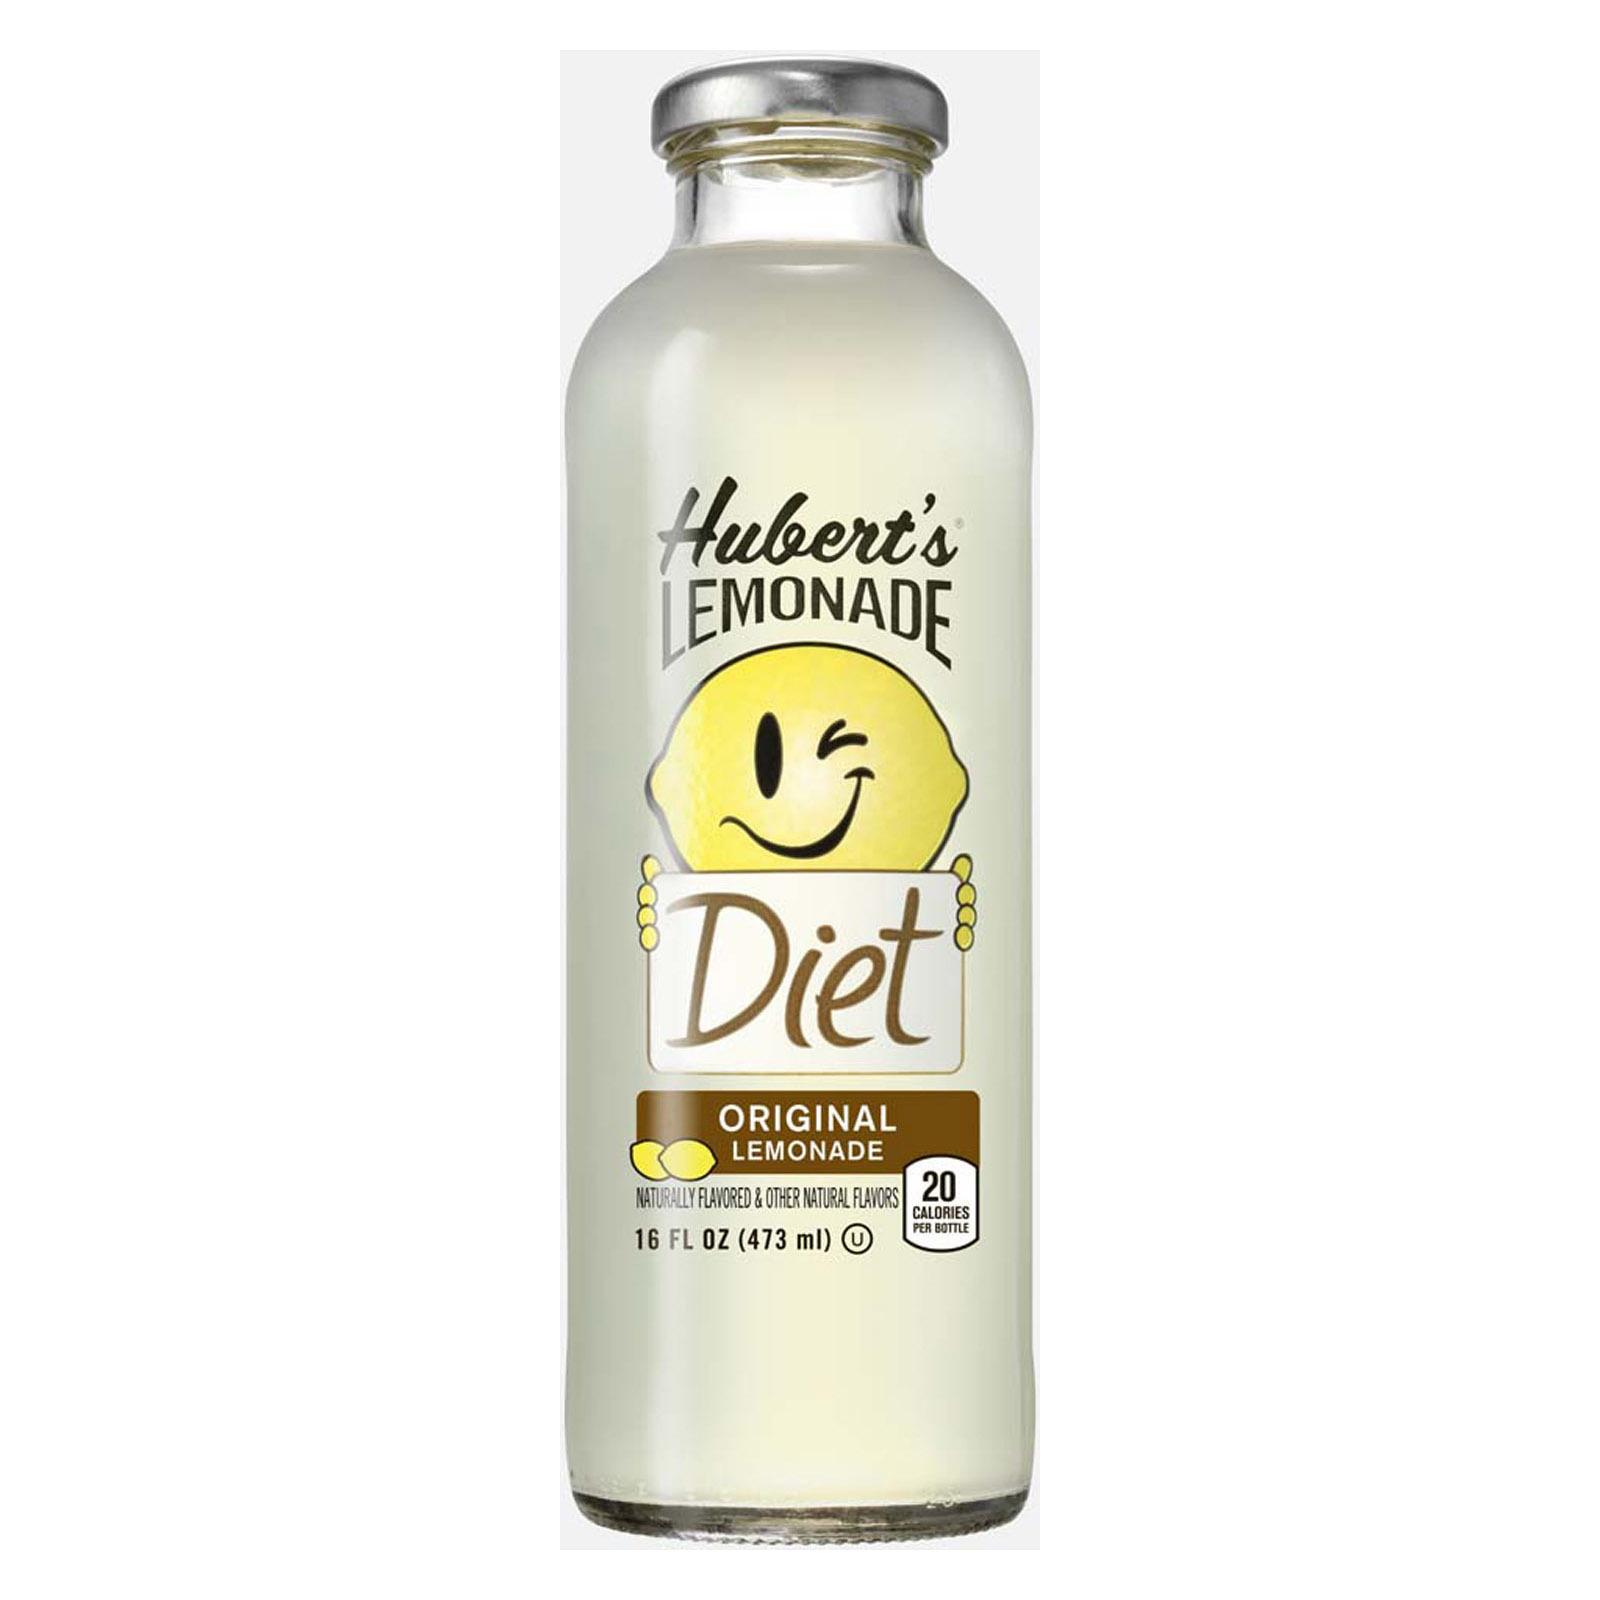 Hubert's Diet Lemonade, Original, 16 fl oz